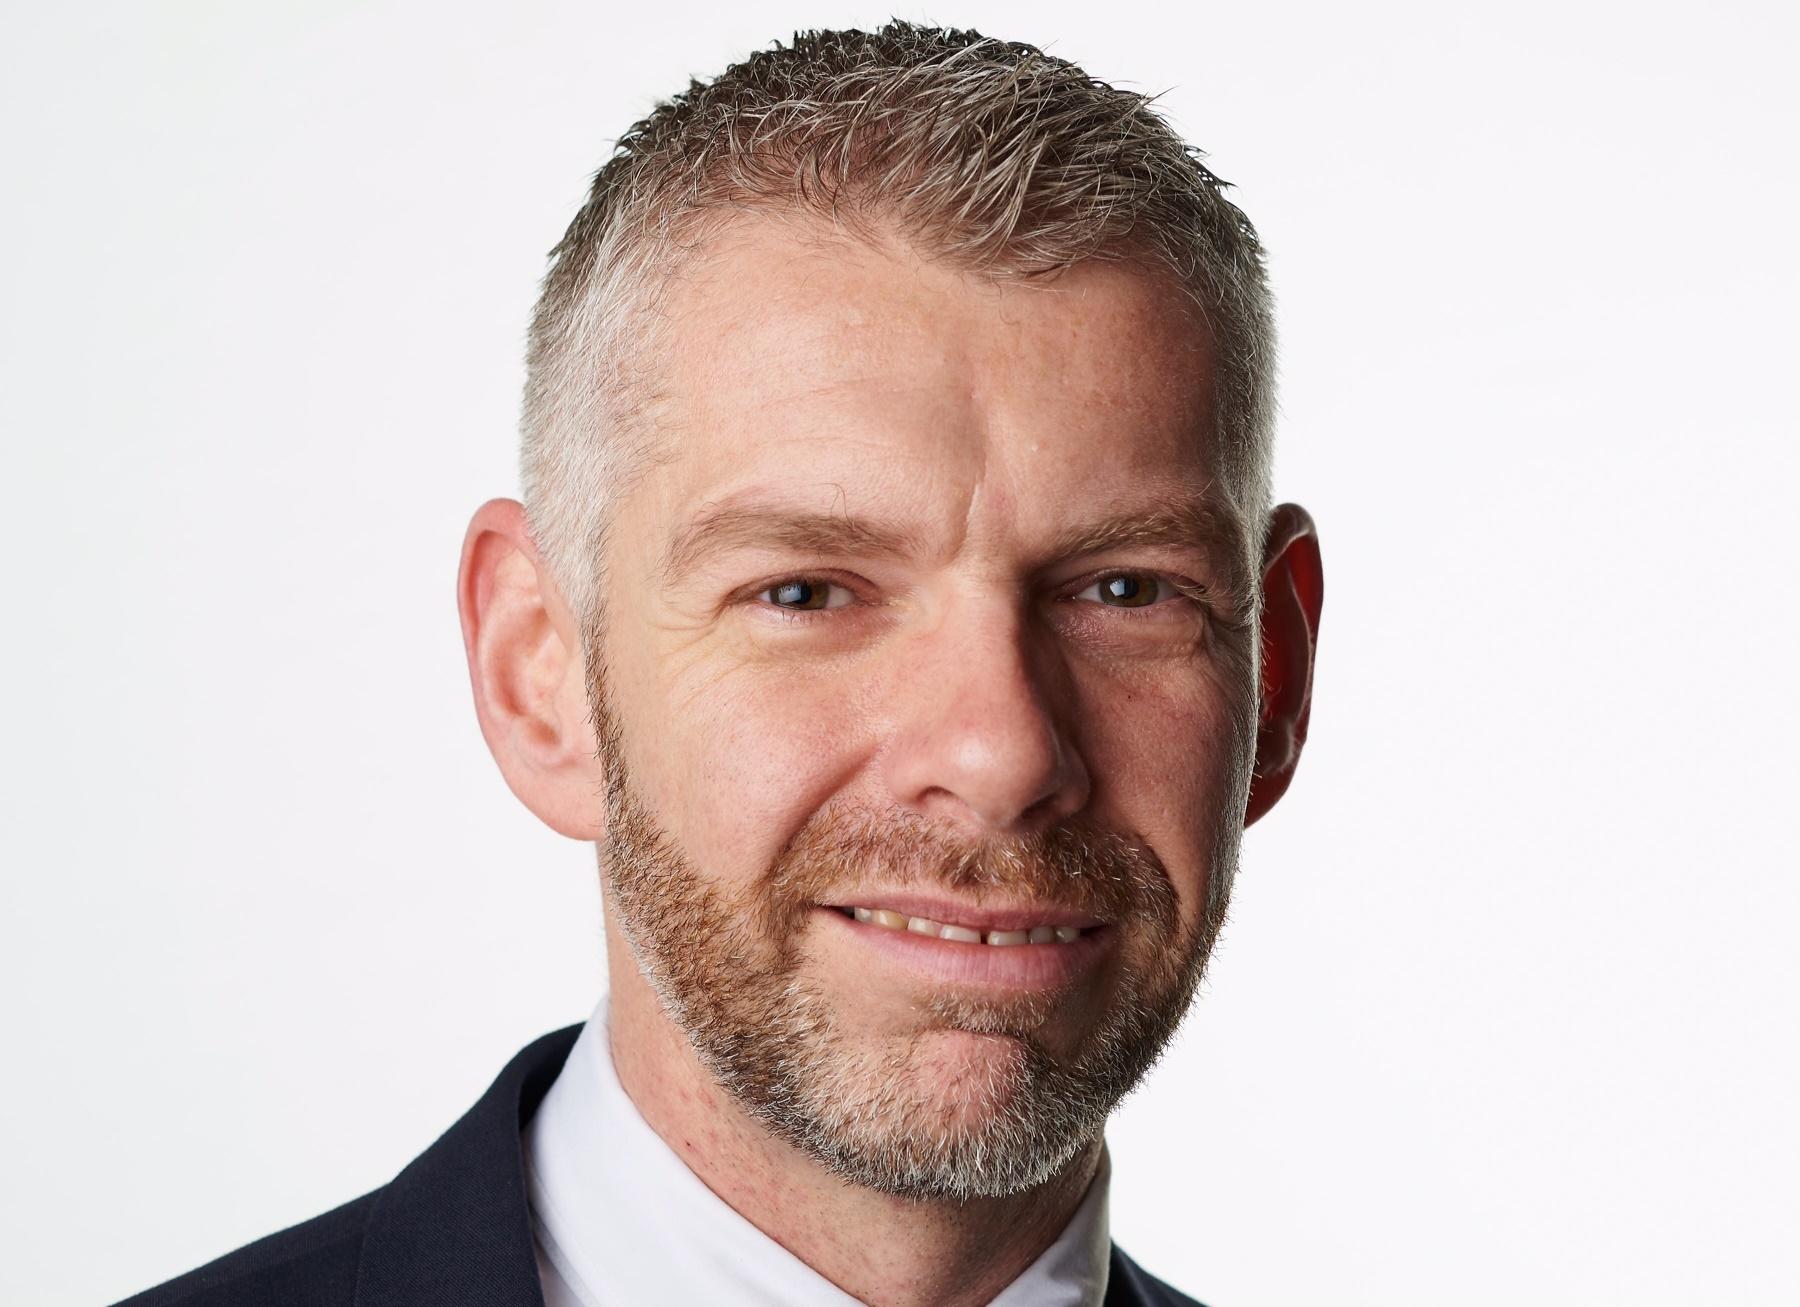 David Surley, Head of Airline Relations i Aarhus Lufthavn.